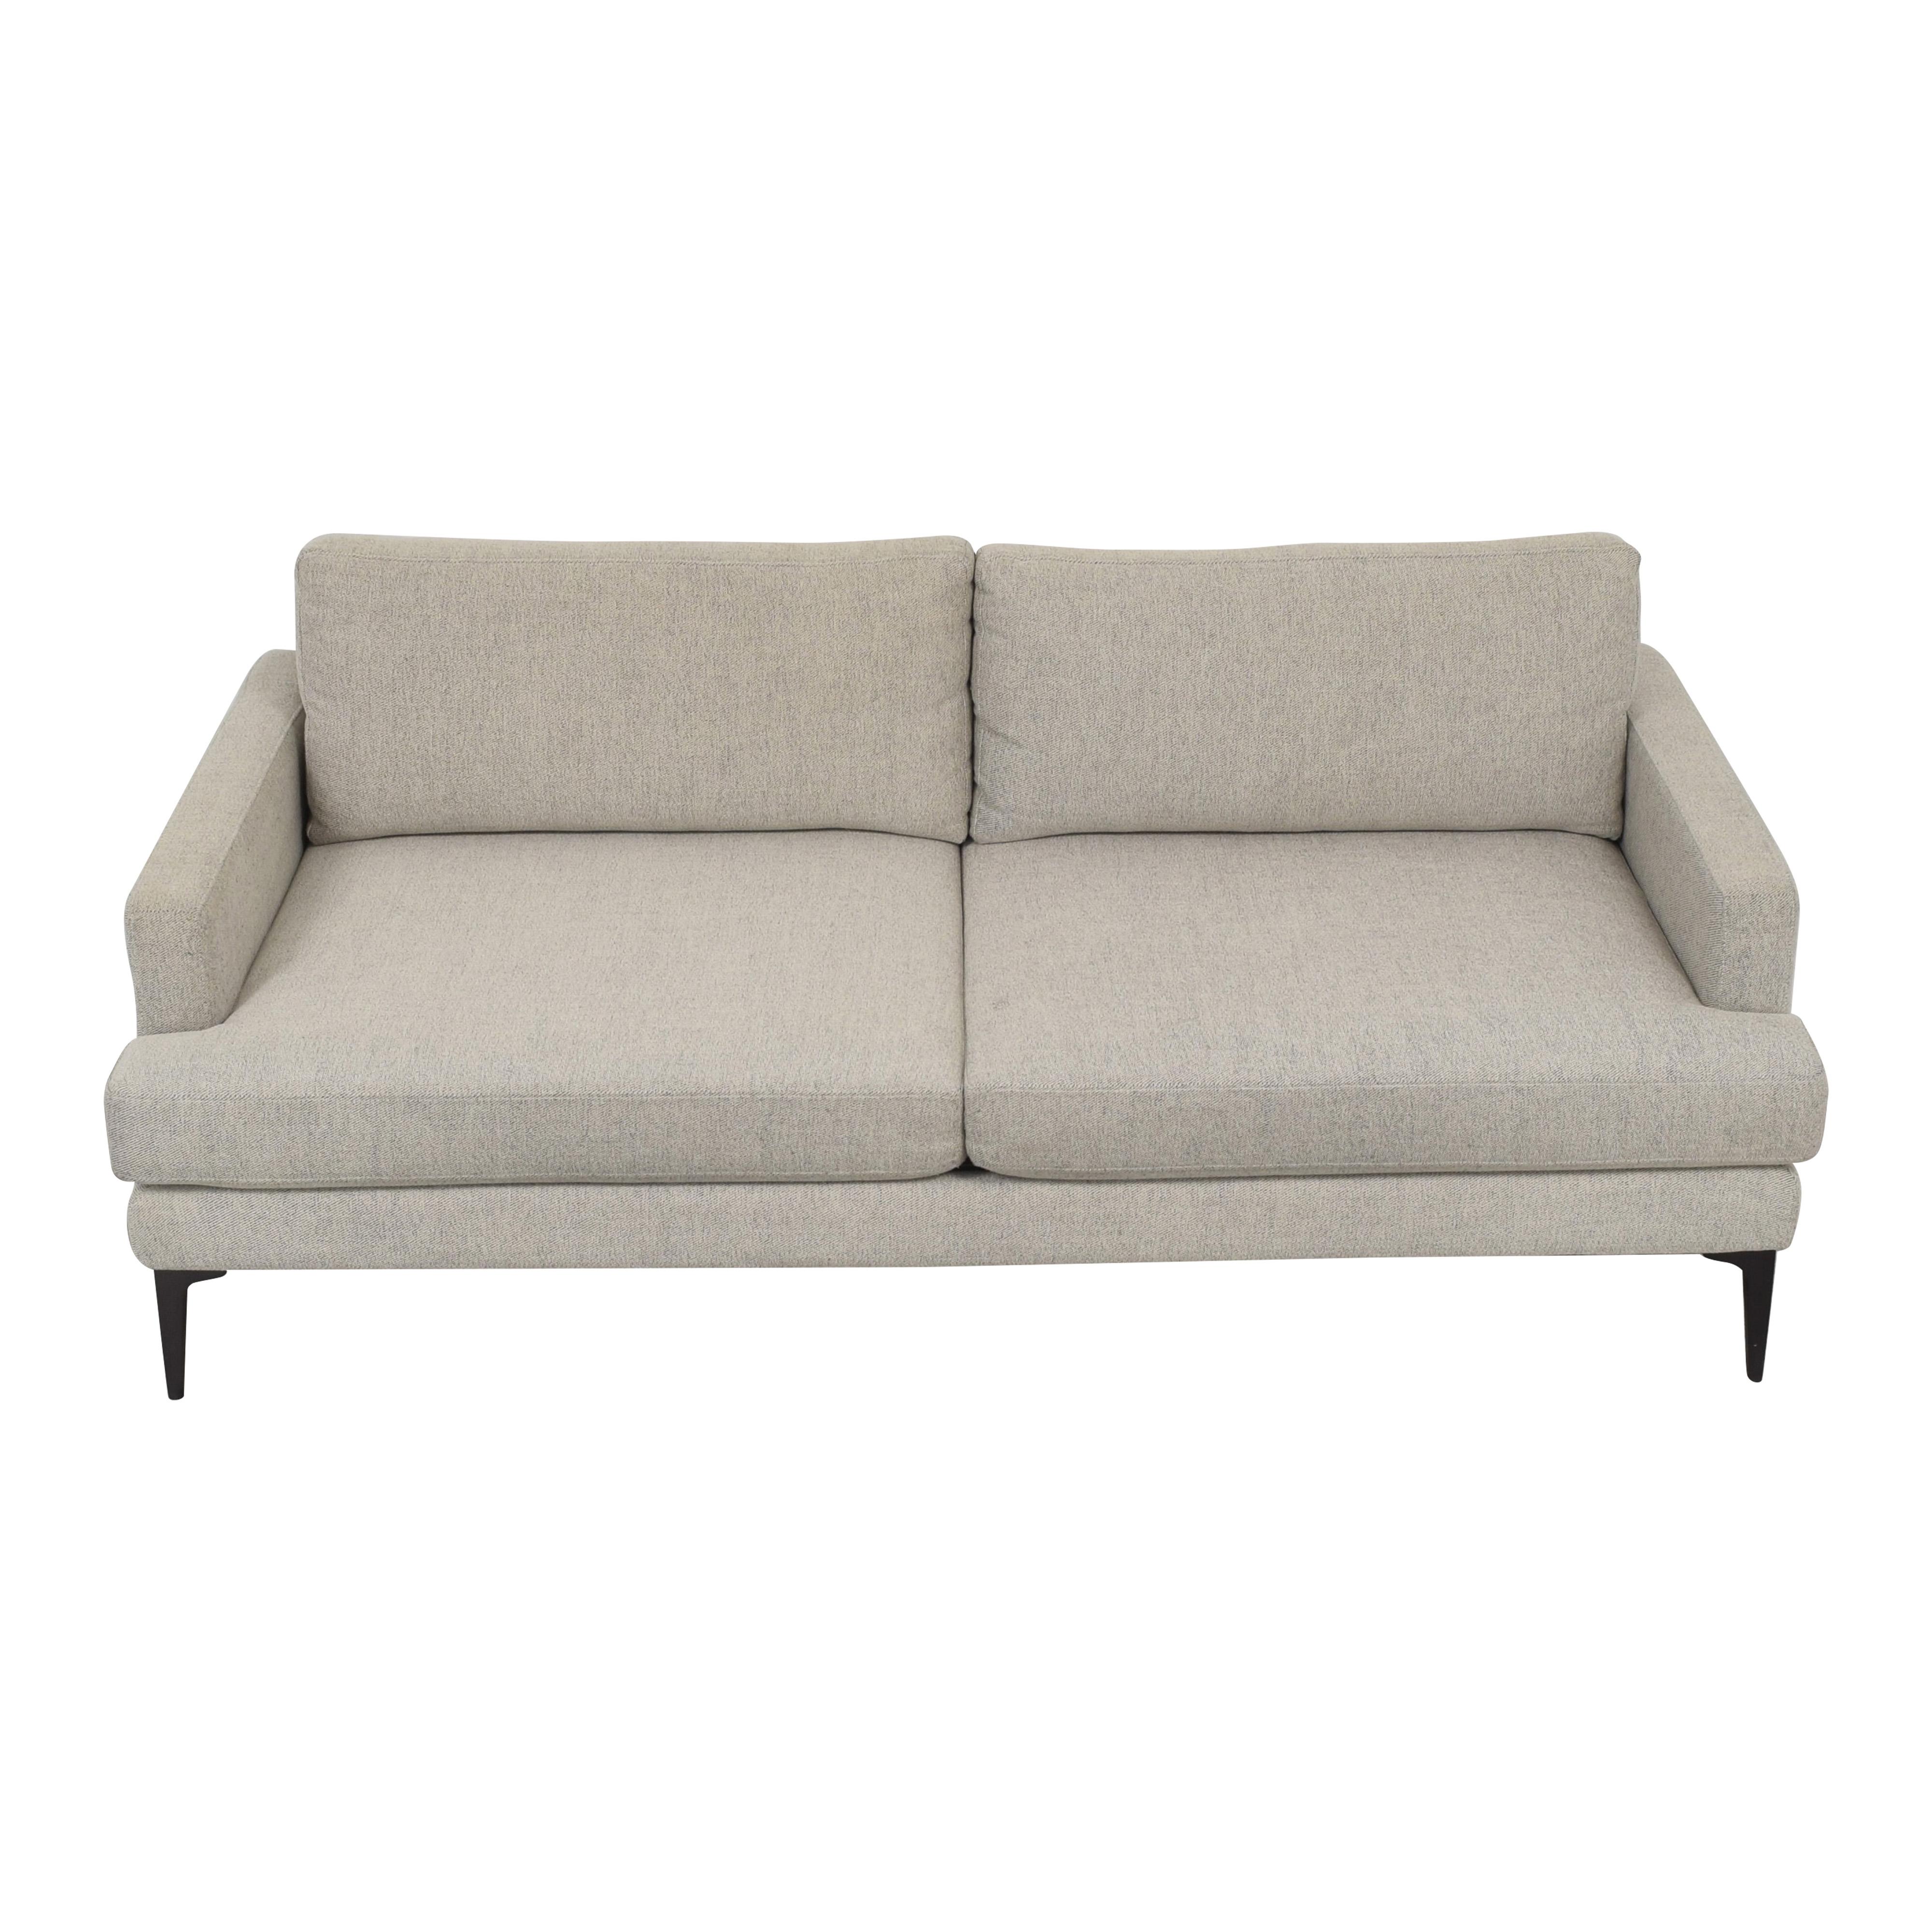 West Elm West Elm Andes Sofa Classic Sofas